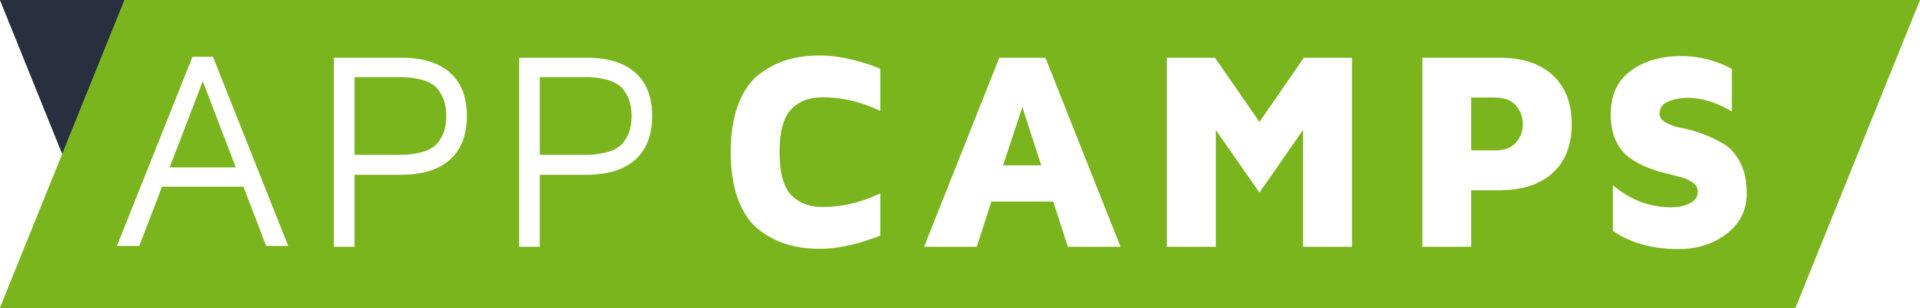 App Camps Logo